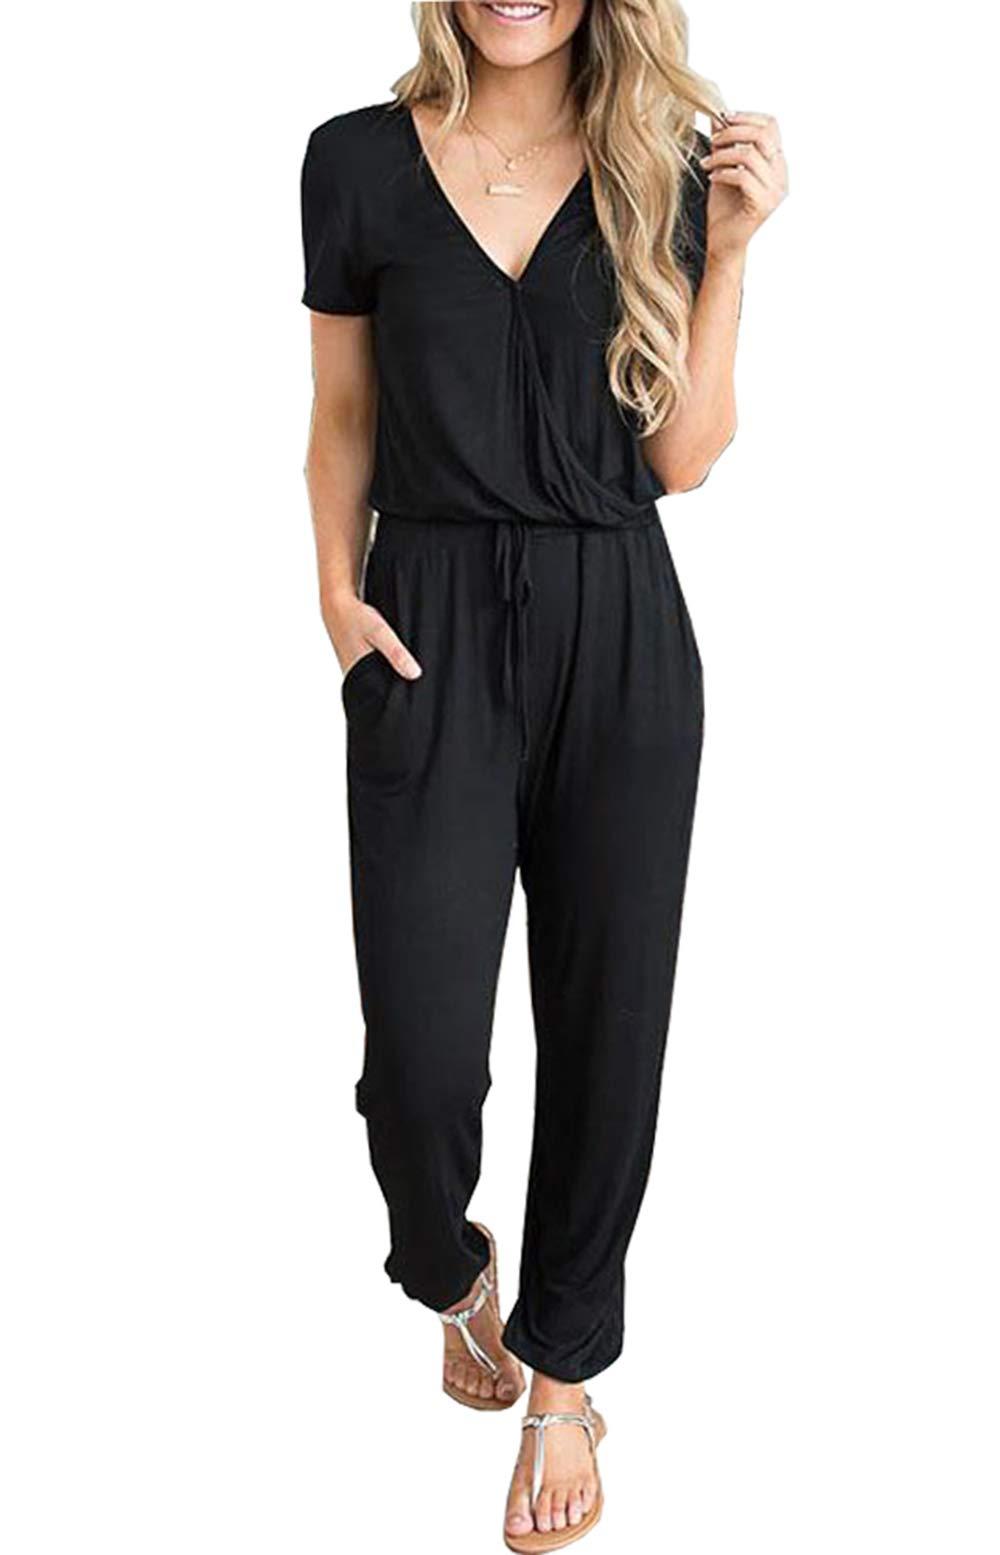 PRETTYGARDEN Off Shoulder Sleeve Hollow Out Sexy Women Bodycon Long Jumpsuit Rompers (Medium, 101002 Black) by PRETTYGARDEN